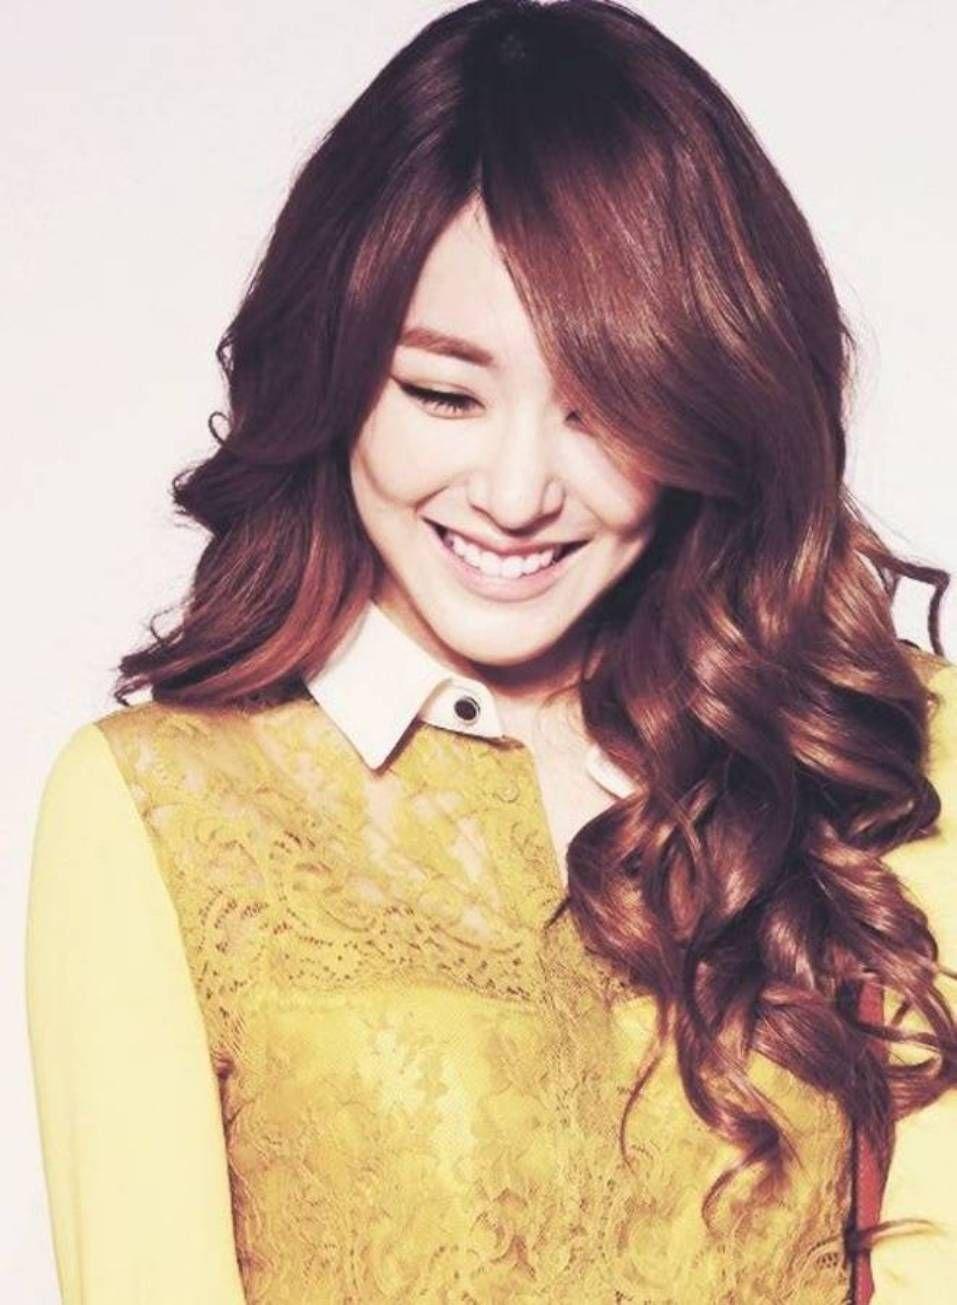 Enjoyable Korean Hairstyles Women Korean Hairstyles And For Women On Pinterest Short Hairstyles Gunalazisus